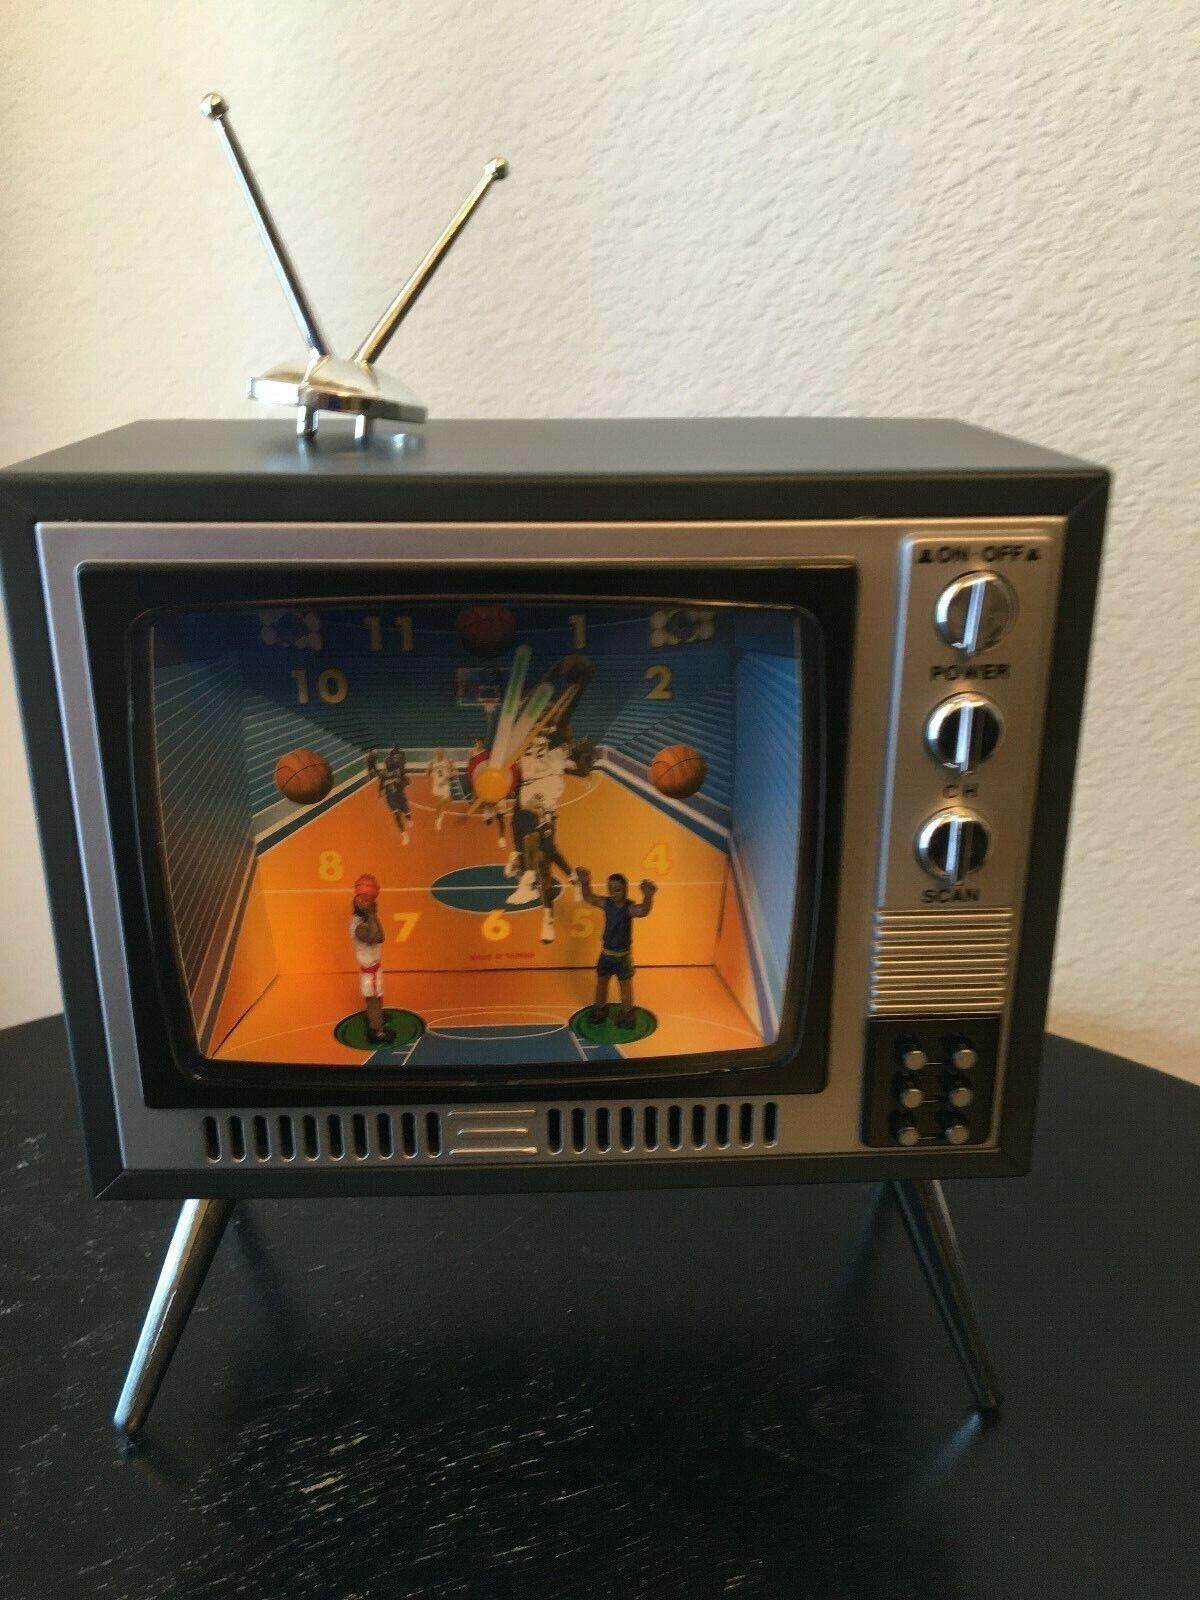 Tv Basketball Sport Style Television Novelty Alarm Clock For Sale Online